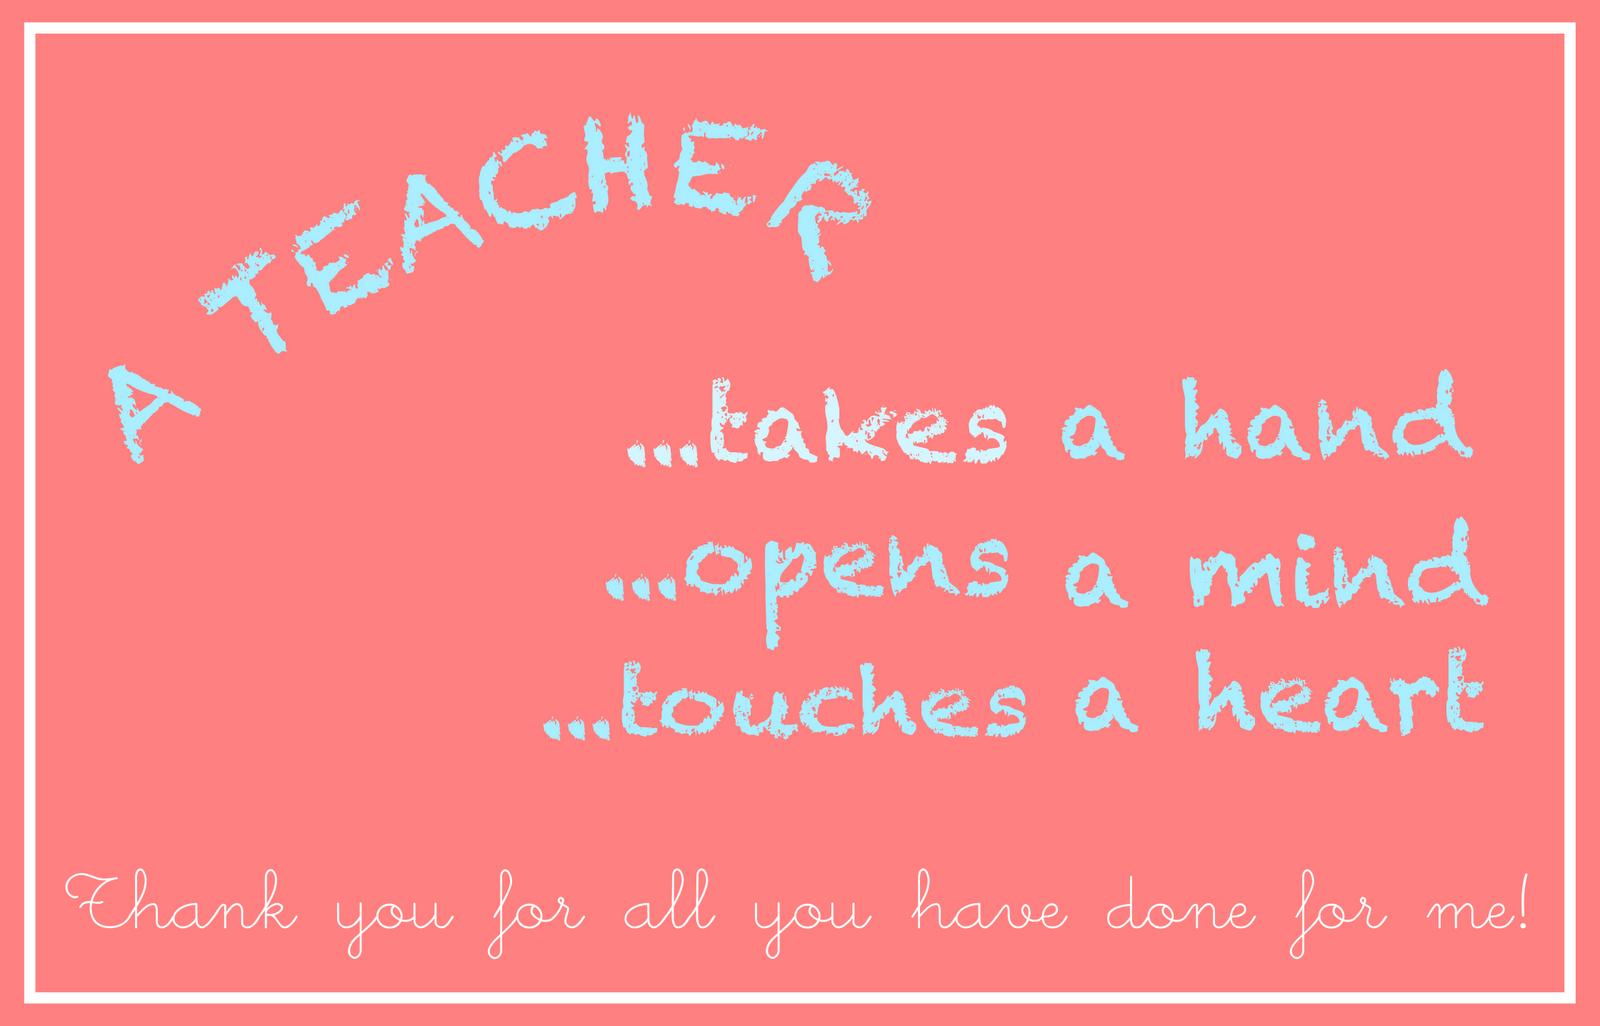 Free Printable Teacher Appreciation Card - An Lehrer Gerichtete - Free Printable Teacher Appreciation Cards